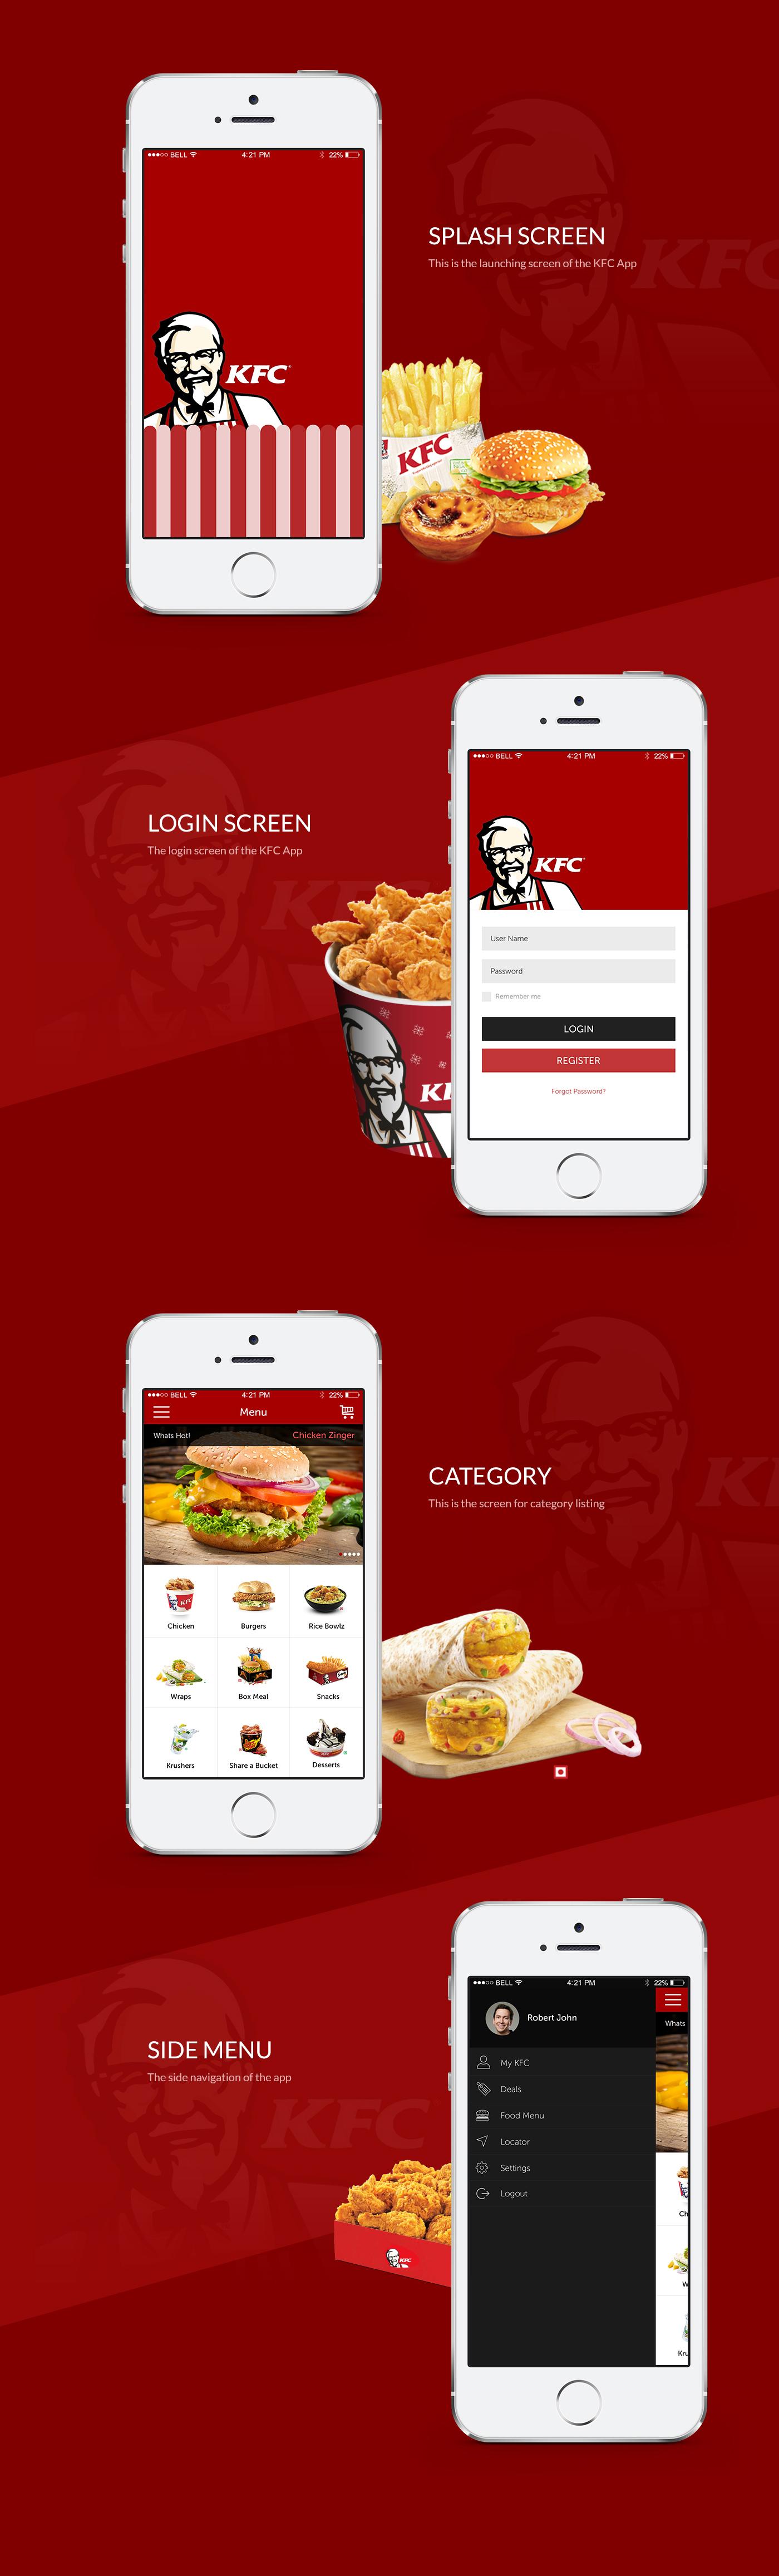 KFC iOS App Redesigning Concepts